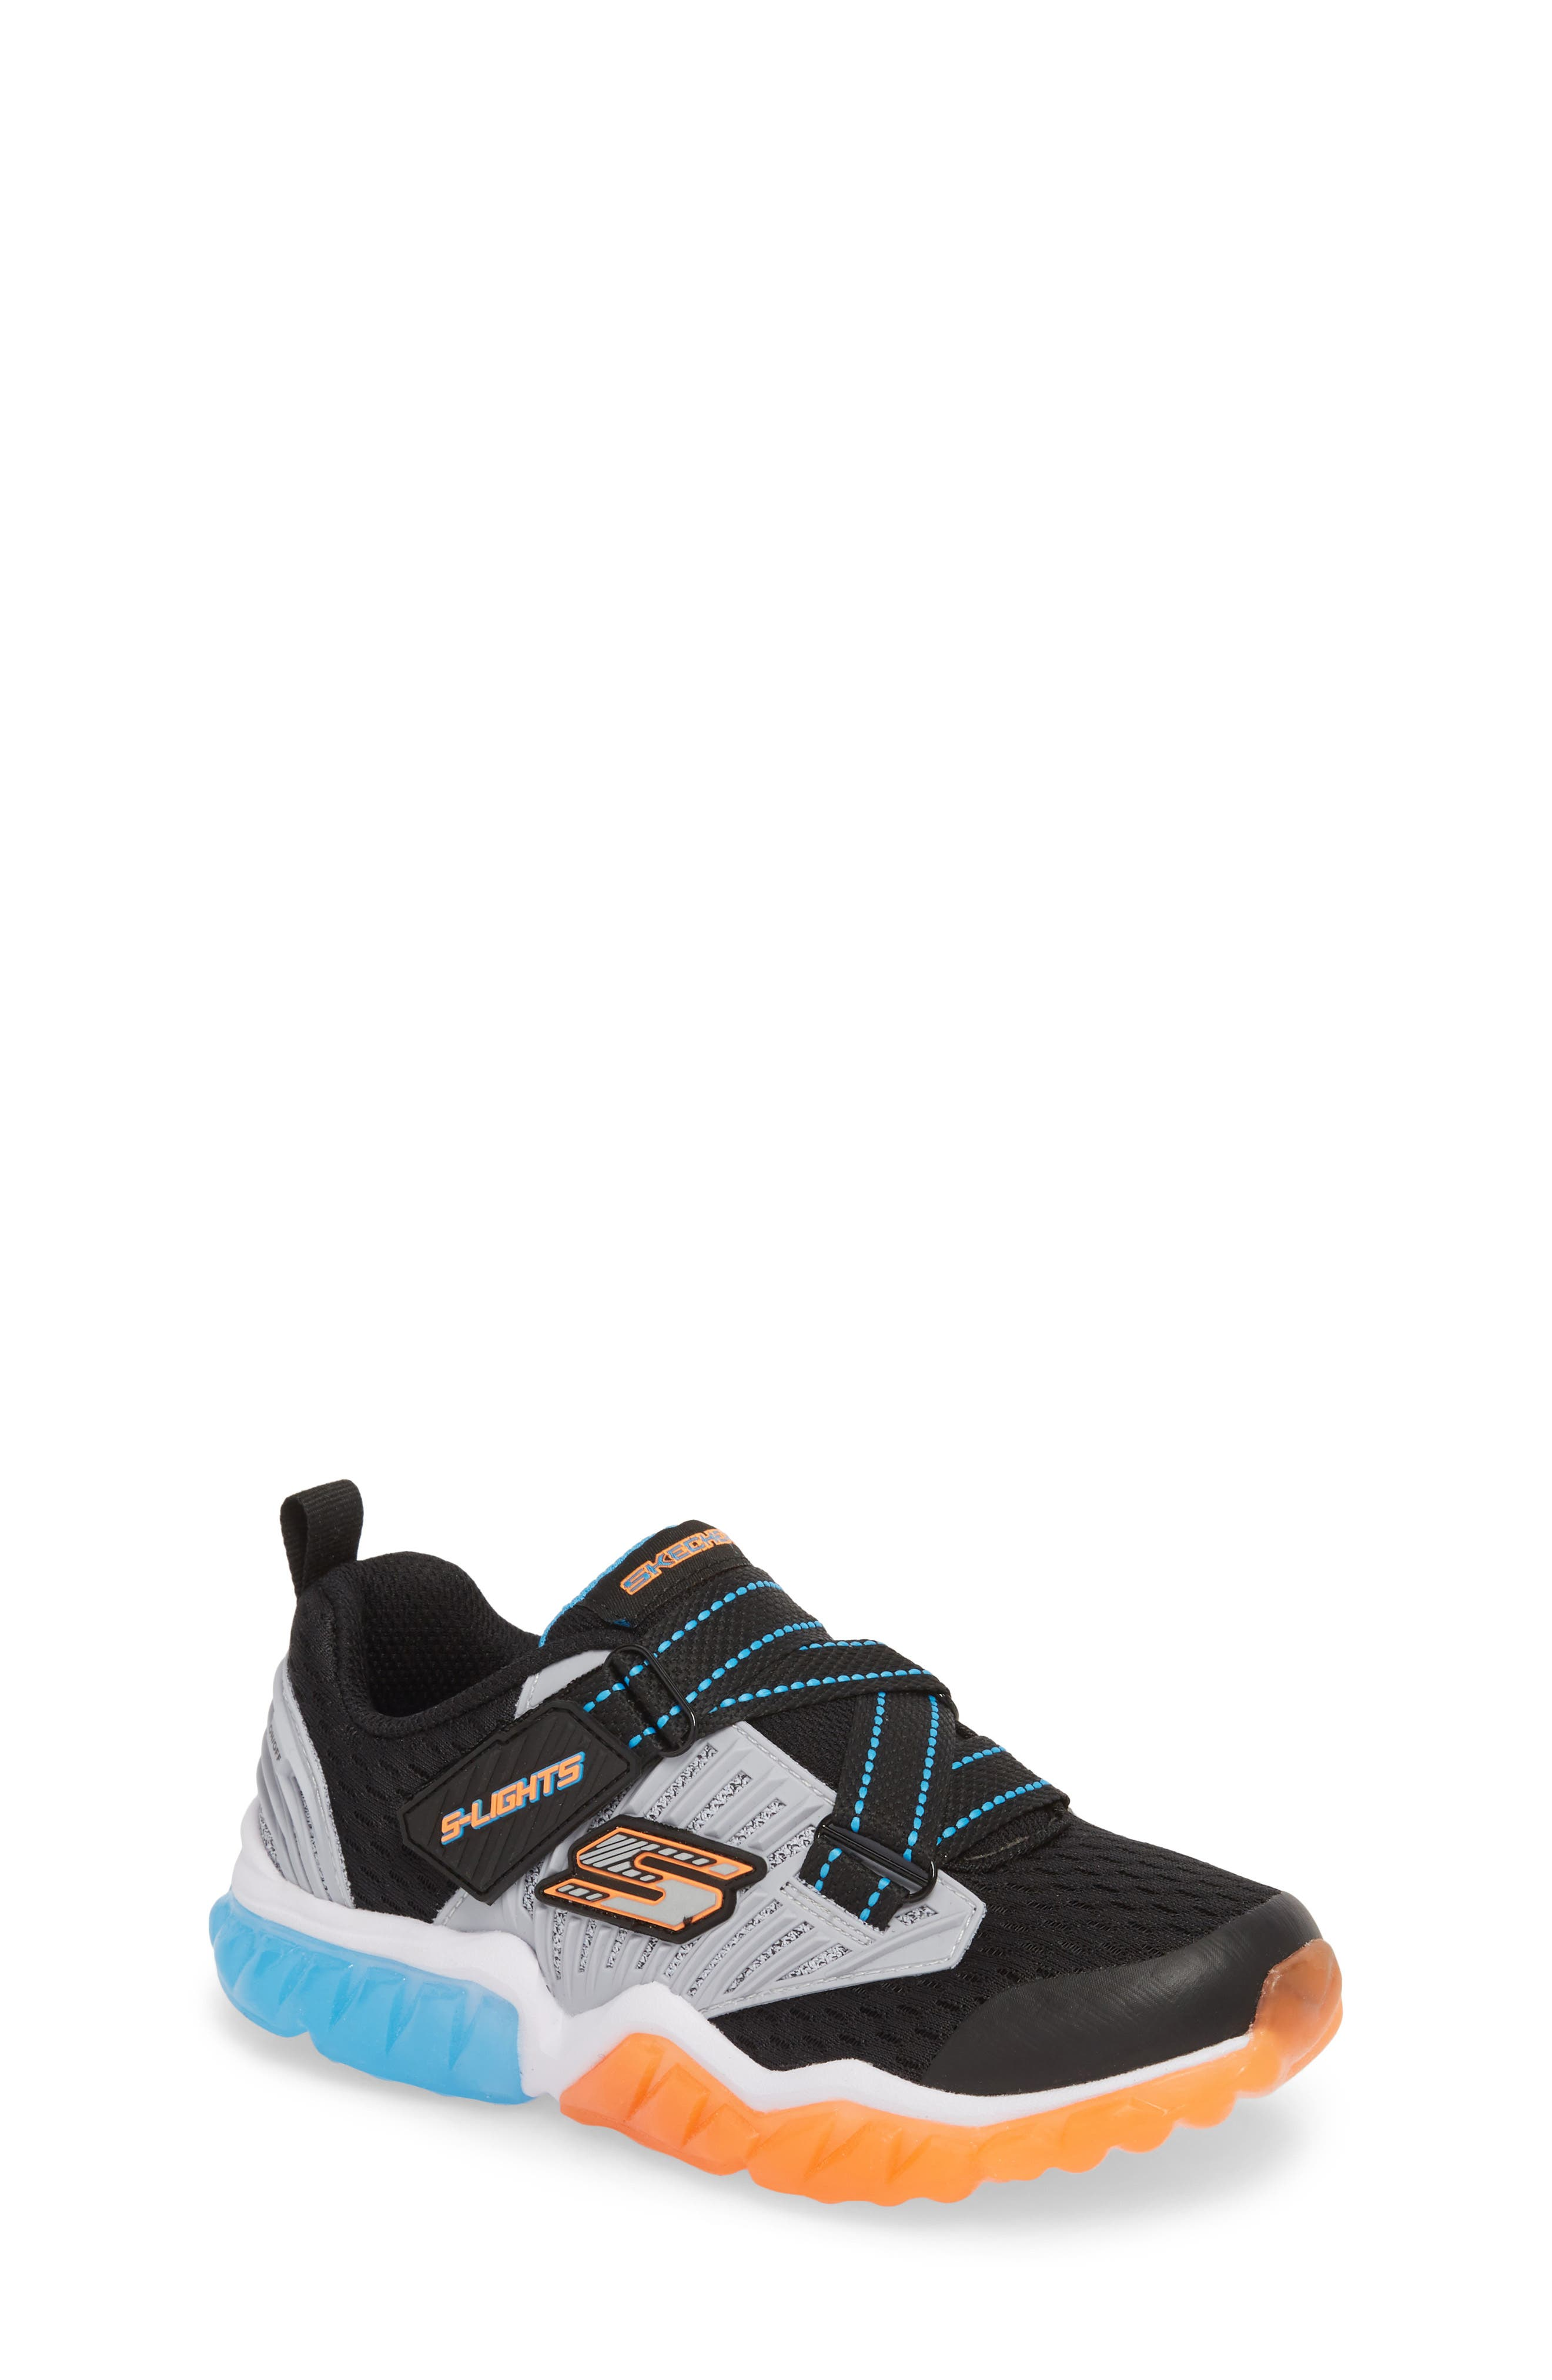 Rapid Flash Light-Up Sneaker,                             Main thumbnail 1, color,                             001